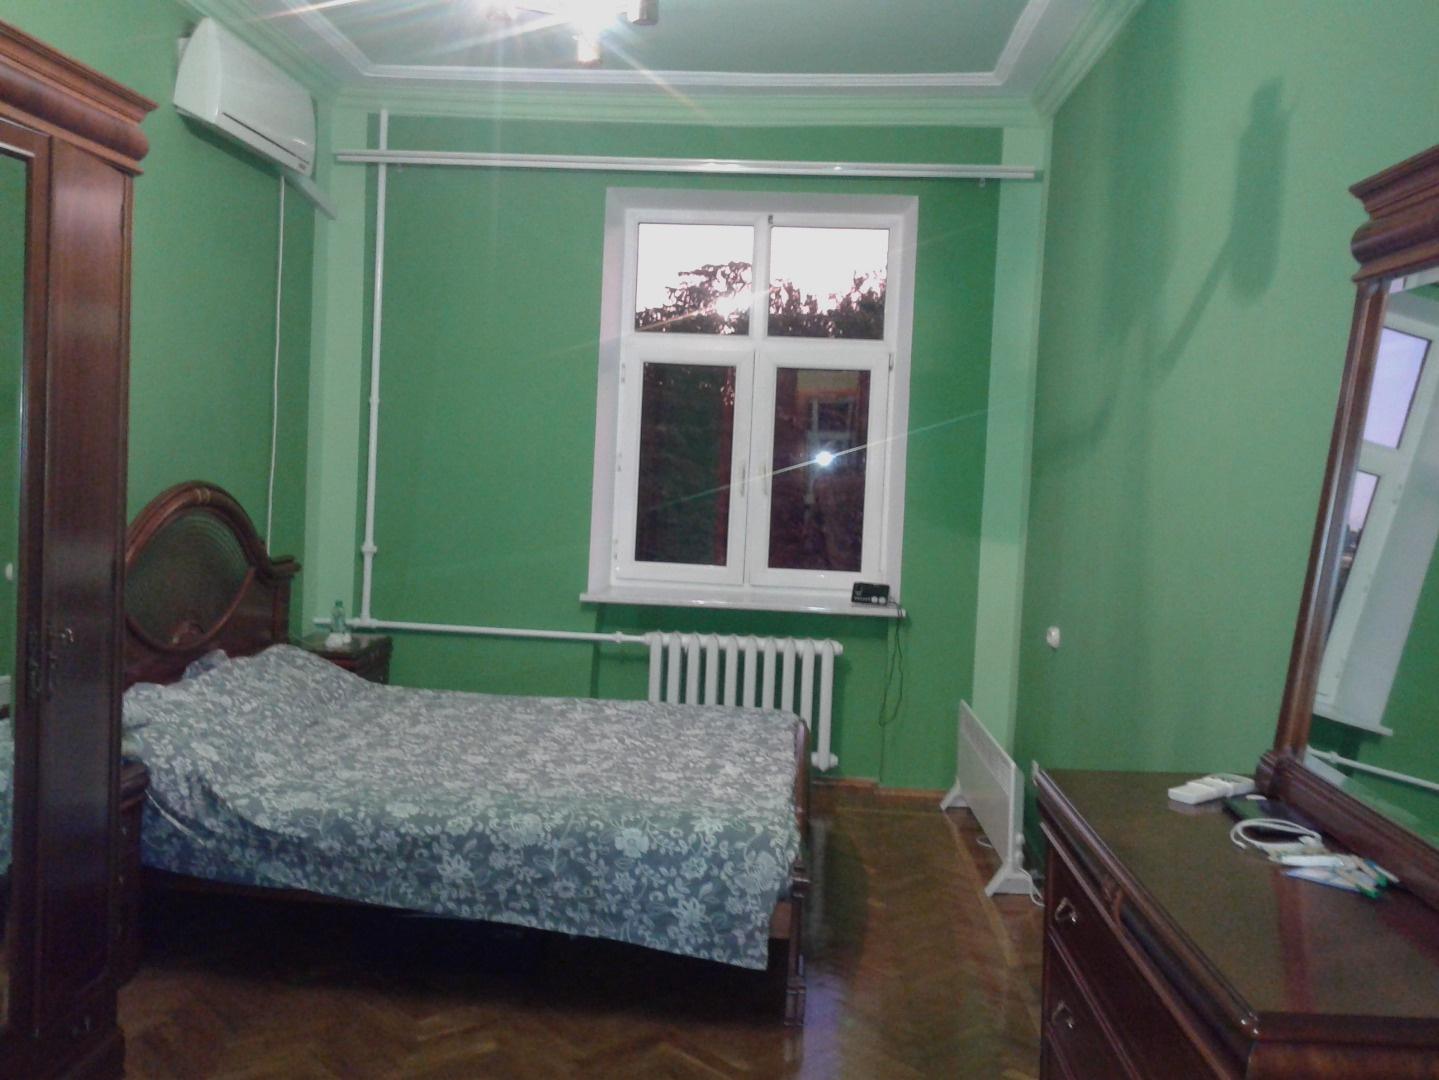 Продается 2-комнатная Квартира на ул. Шевченко Пр. — 90 000 у.е. (фото №3)